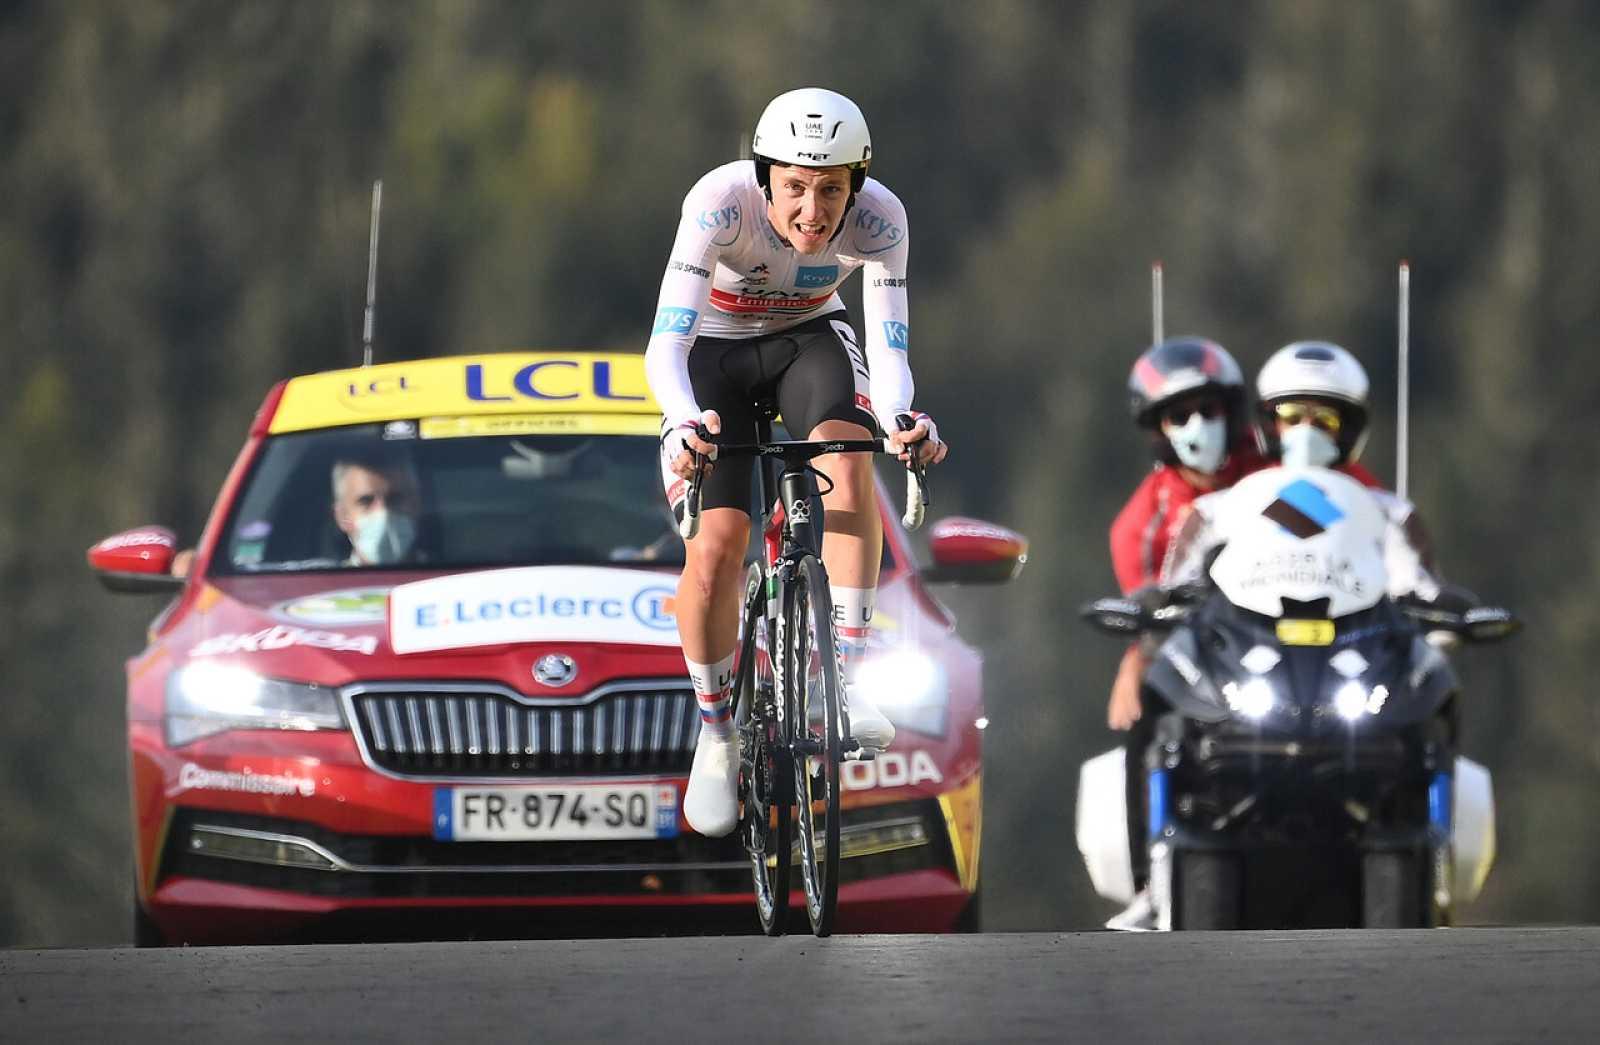 Ciclismo - Tour de Francia - 20ª etapa: Lure - La Planche des Belles Filles (CRI) (3) - ver ahora